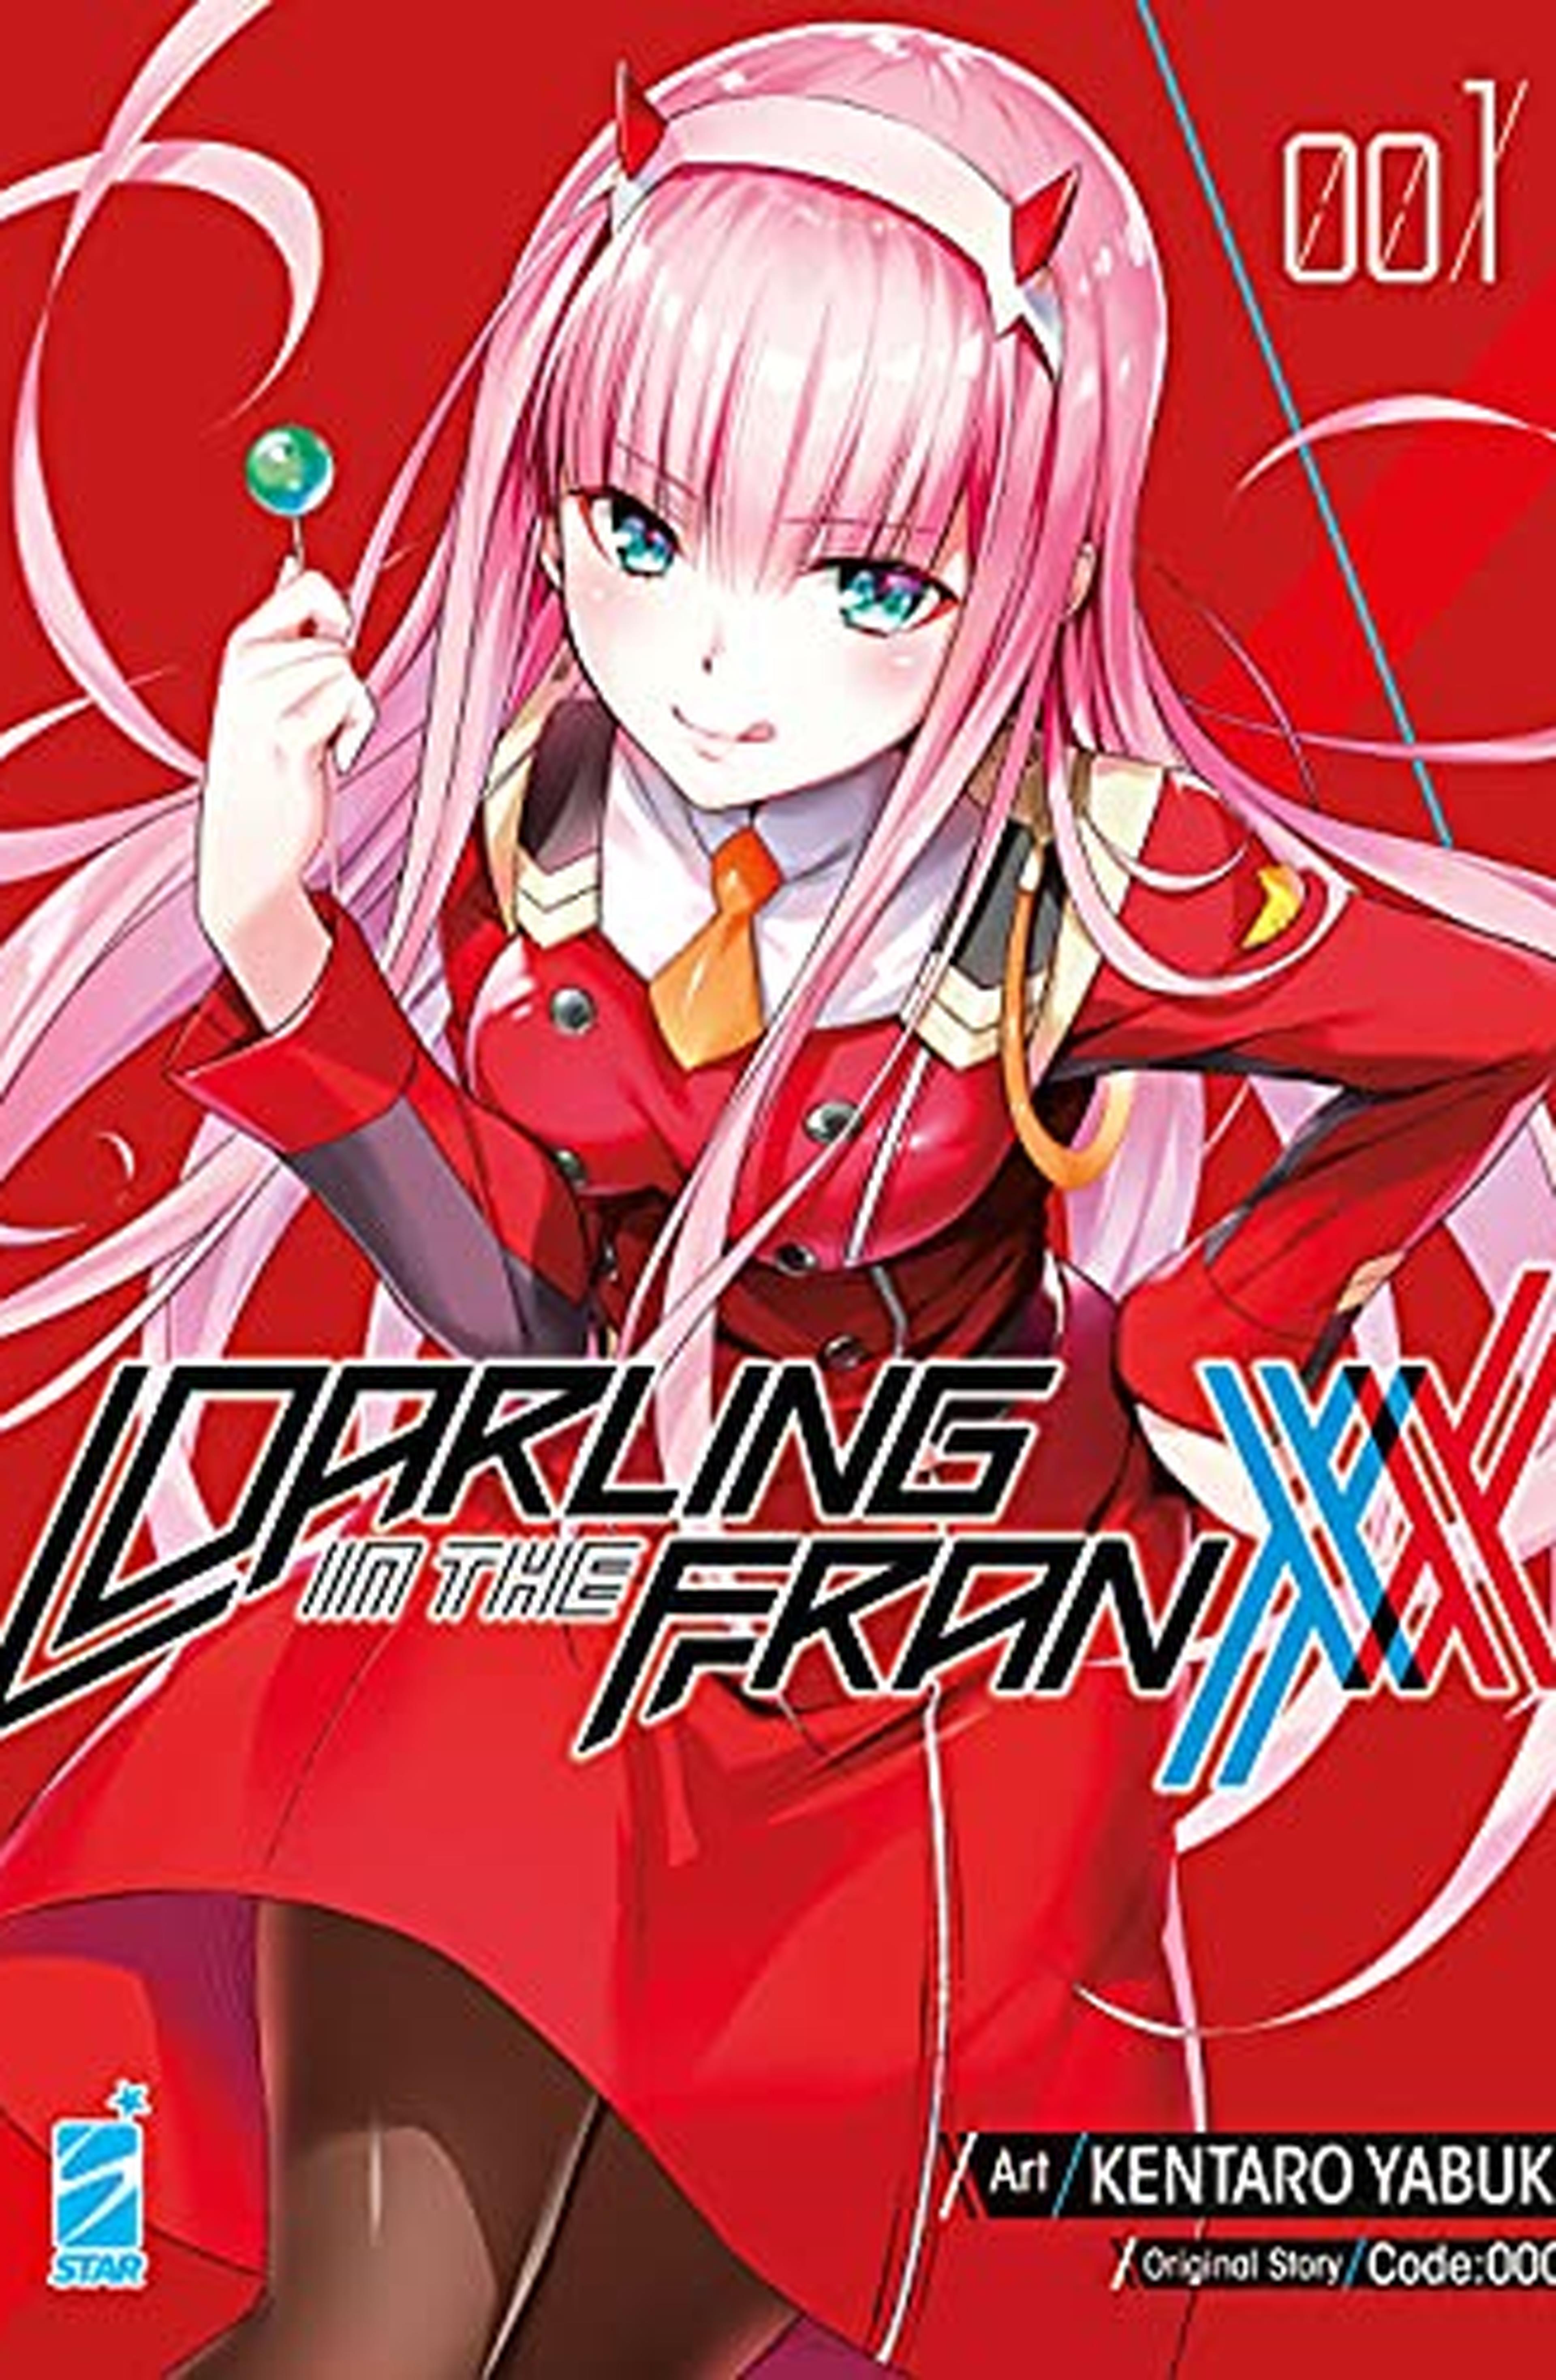 Darling in the Franxx (Vol. 1)